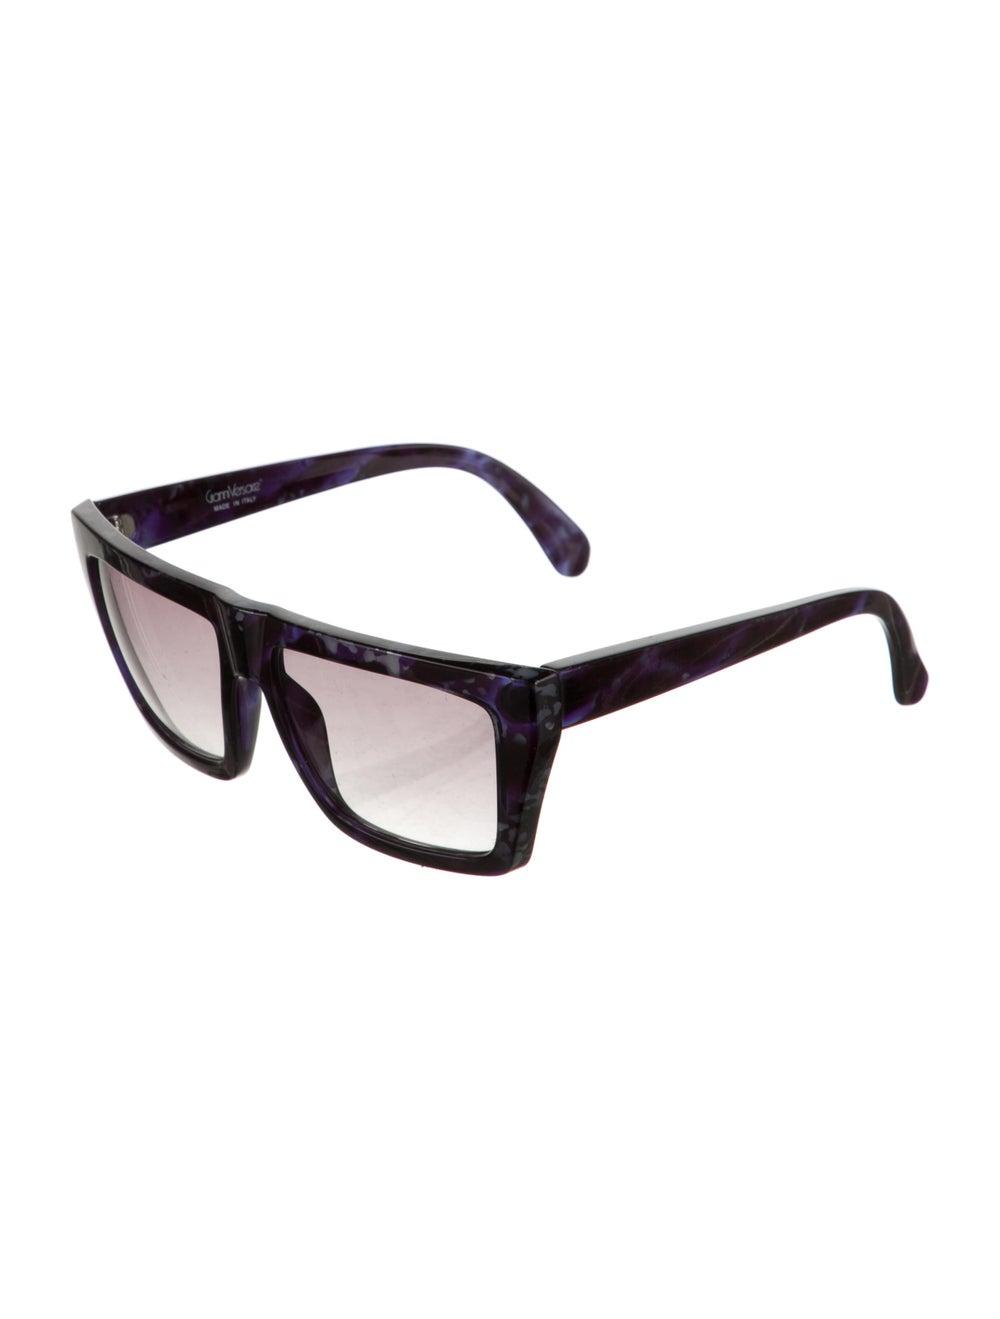 Gianni Versace Square Gradient Sunglasses Blue - image 2